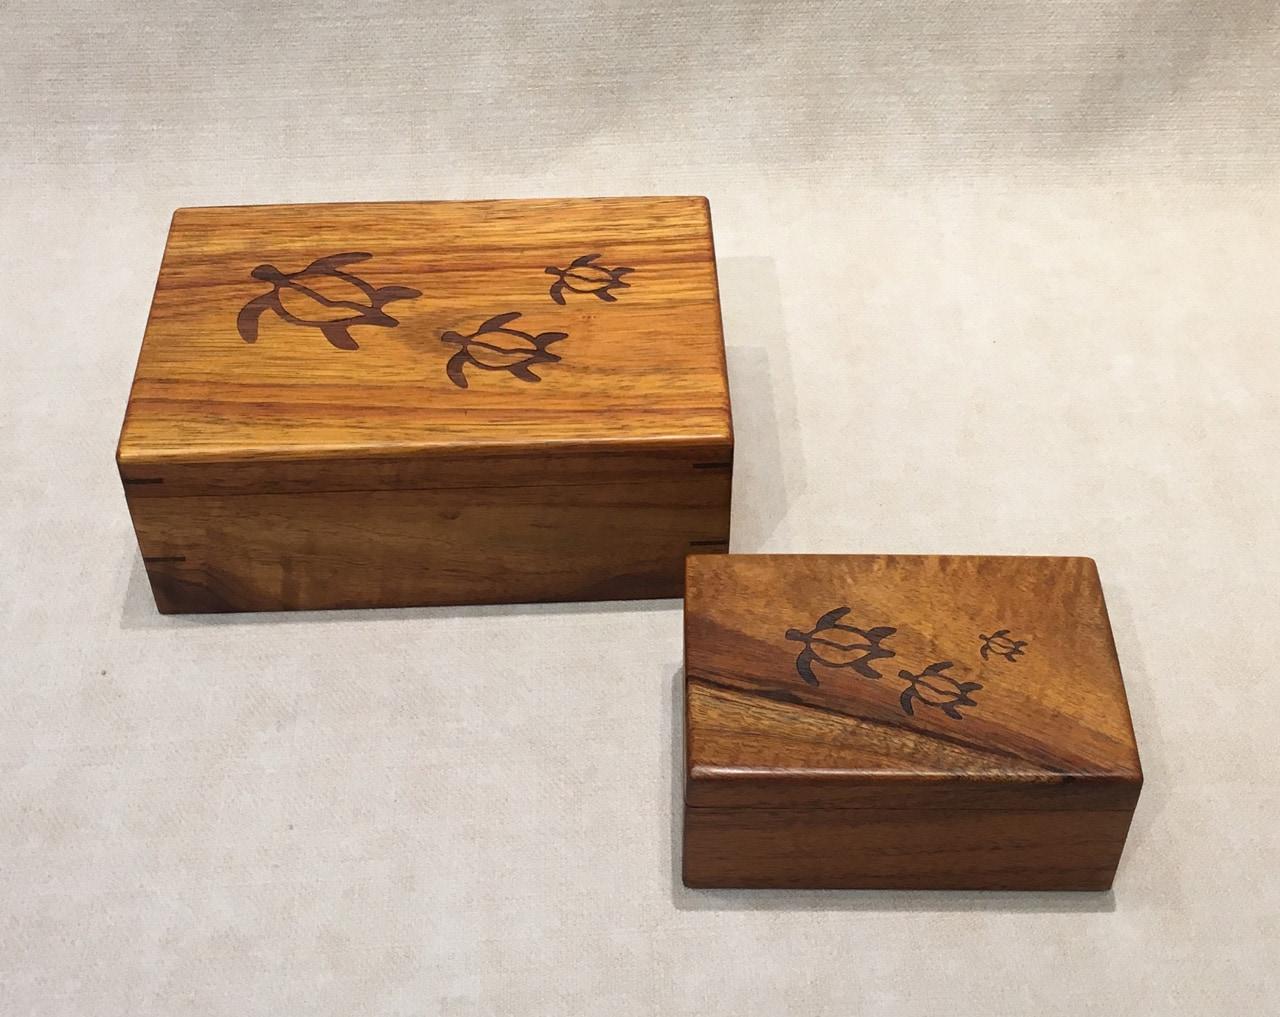 Honu Petroglyph Koa Engraved Boxes Gallery